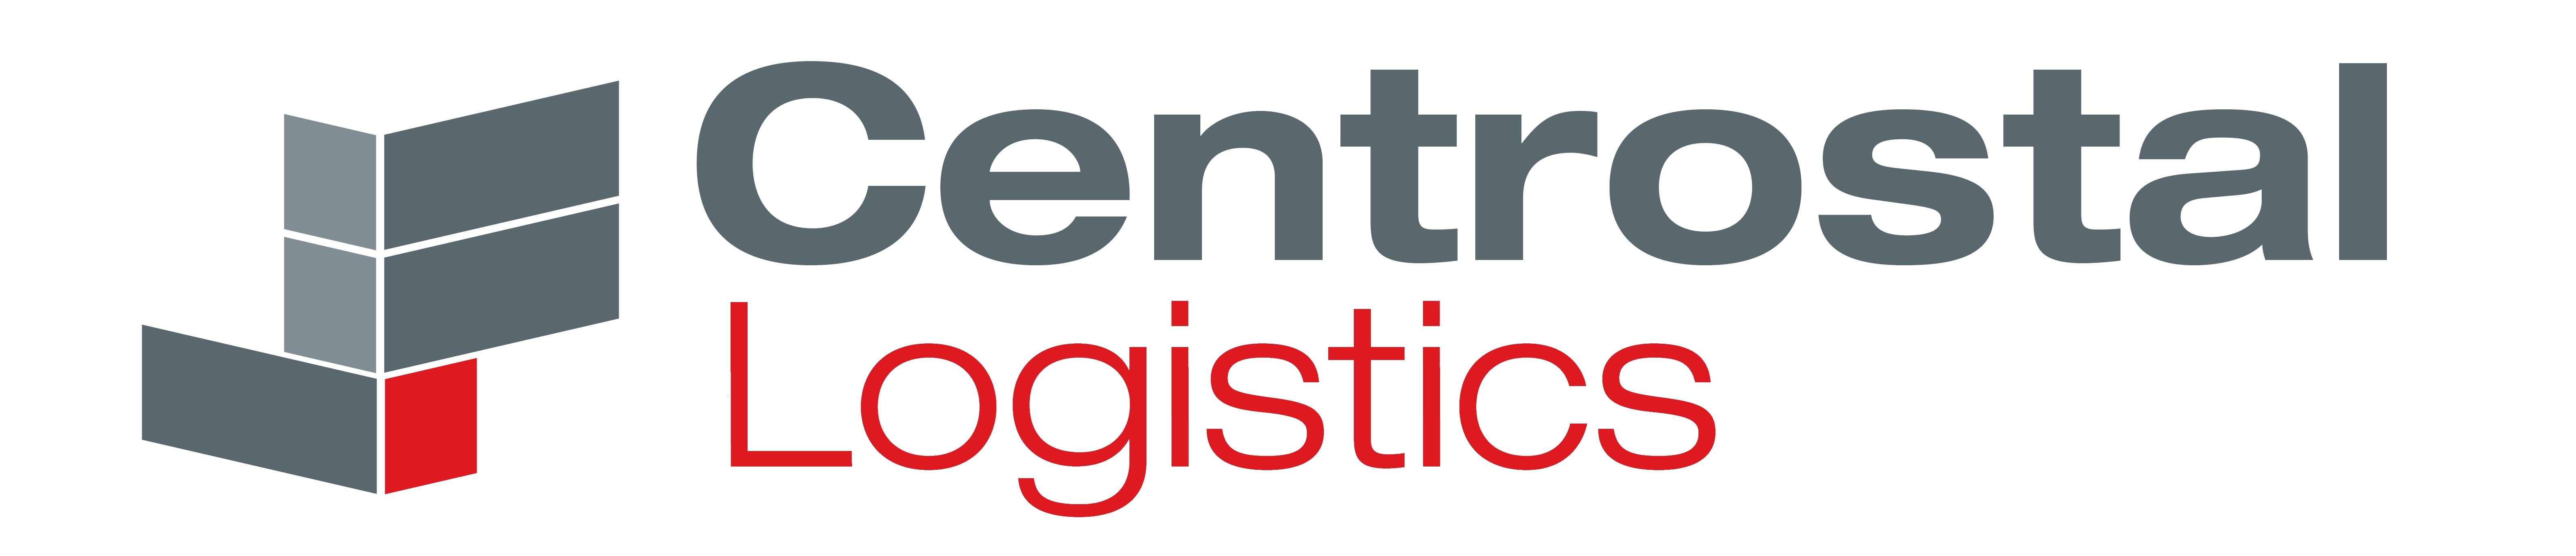 Centrostal Logistics